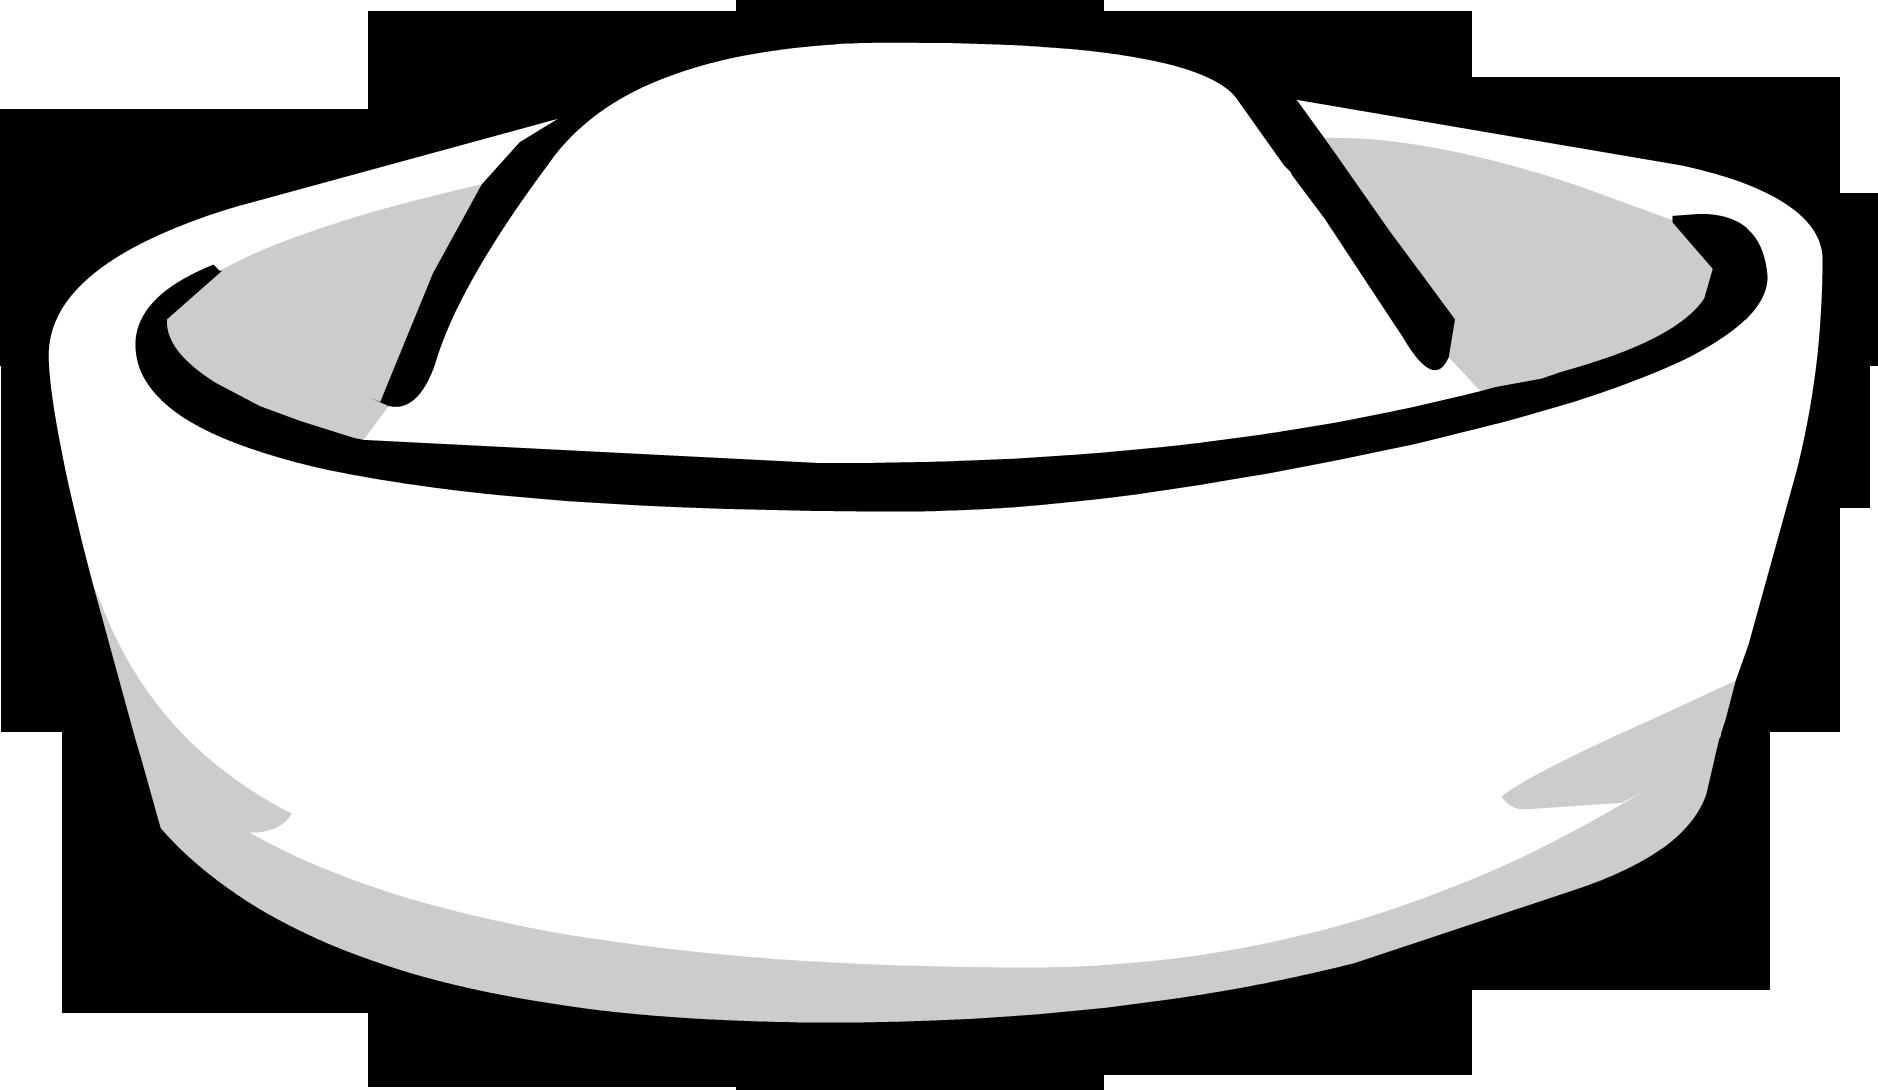 sailor hat club penguin wiki fandom powered by wikia